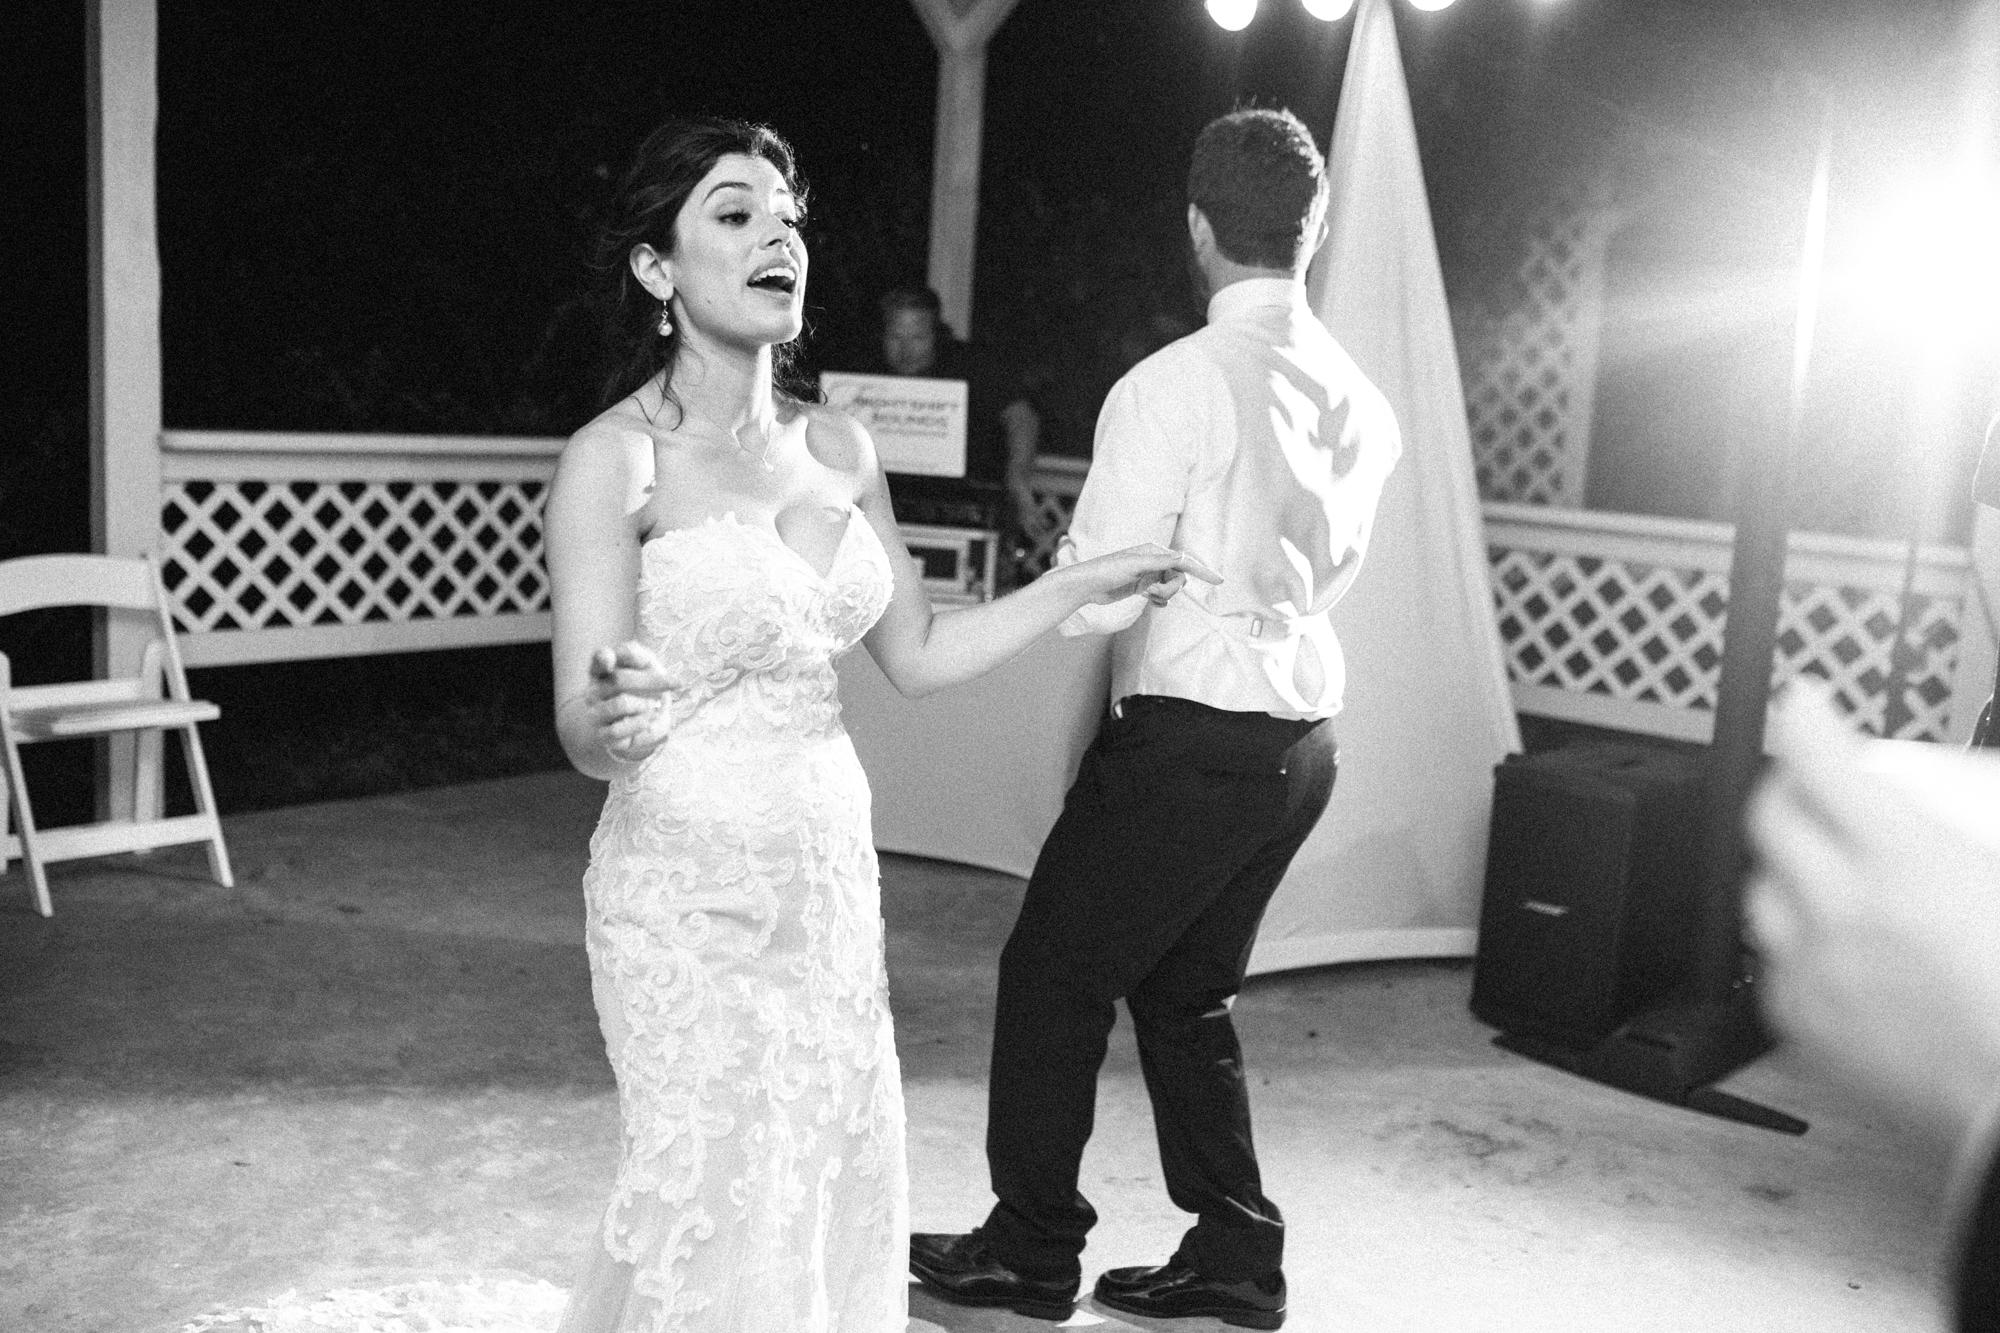 Gautier_Wedding_Photographer-243.jpg